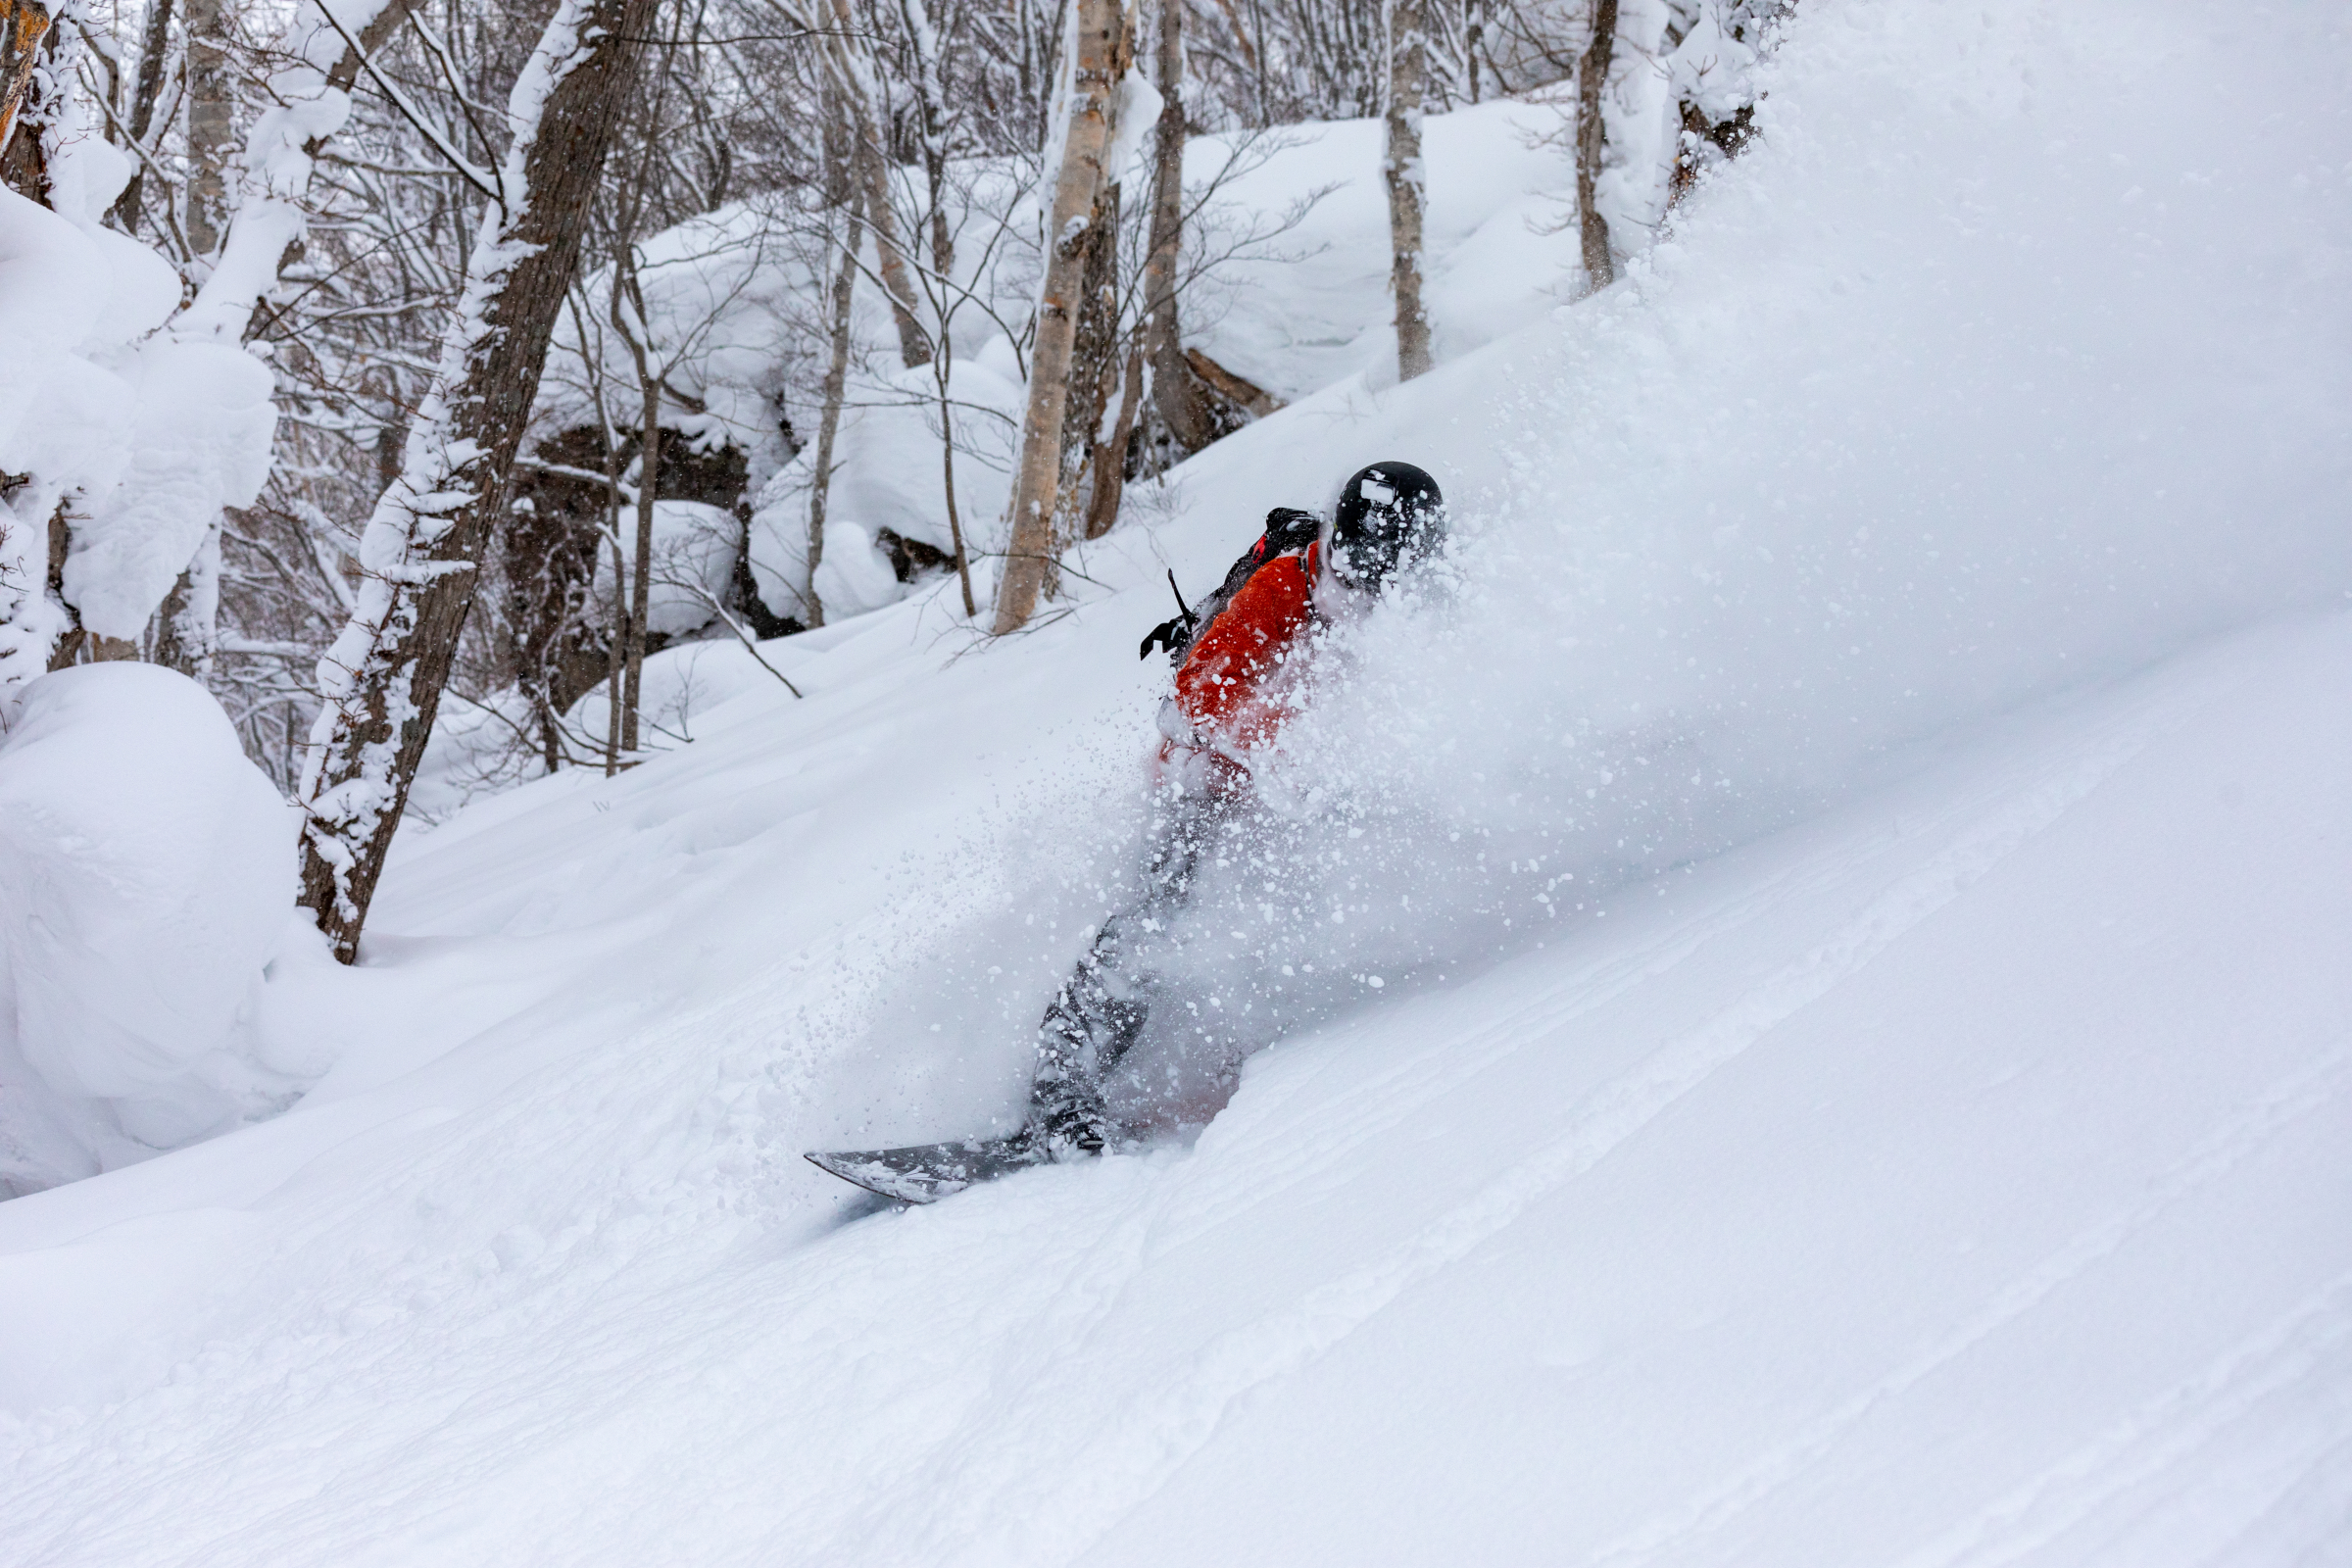 Andi Baumann, Splitboard, Snowboard, Japan, Niseko, Hokkaido